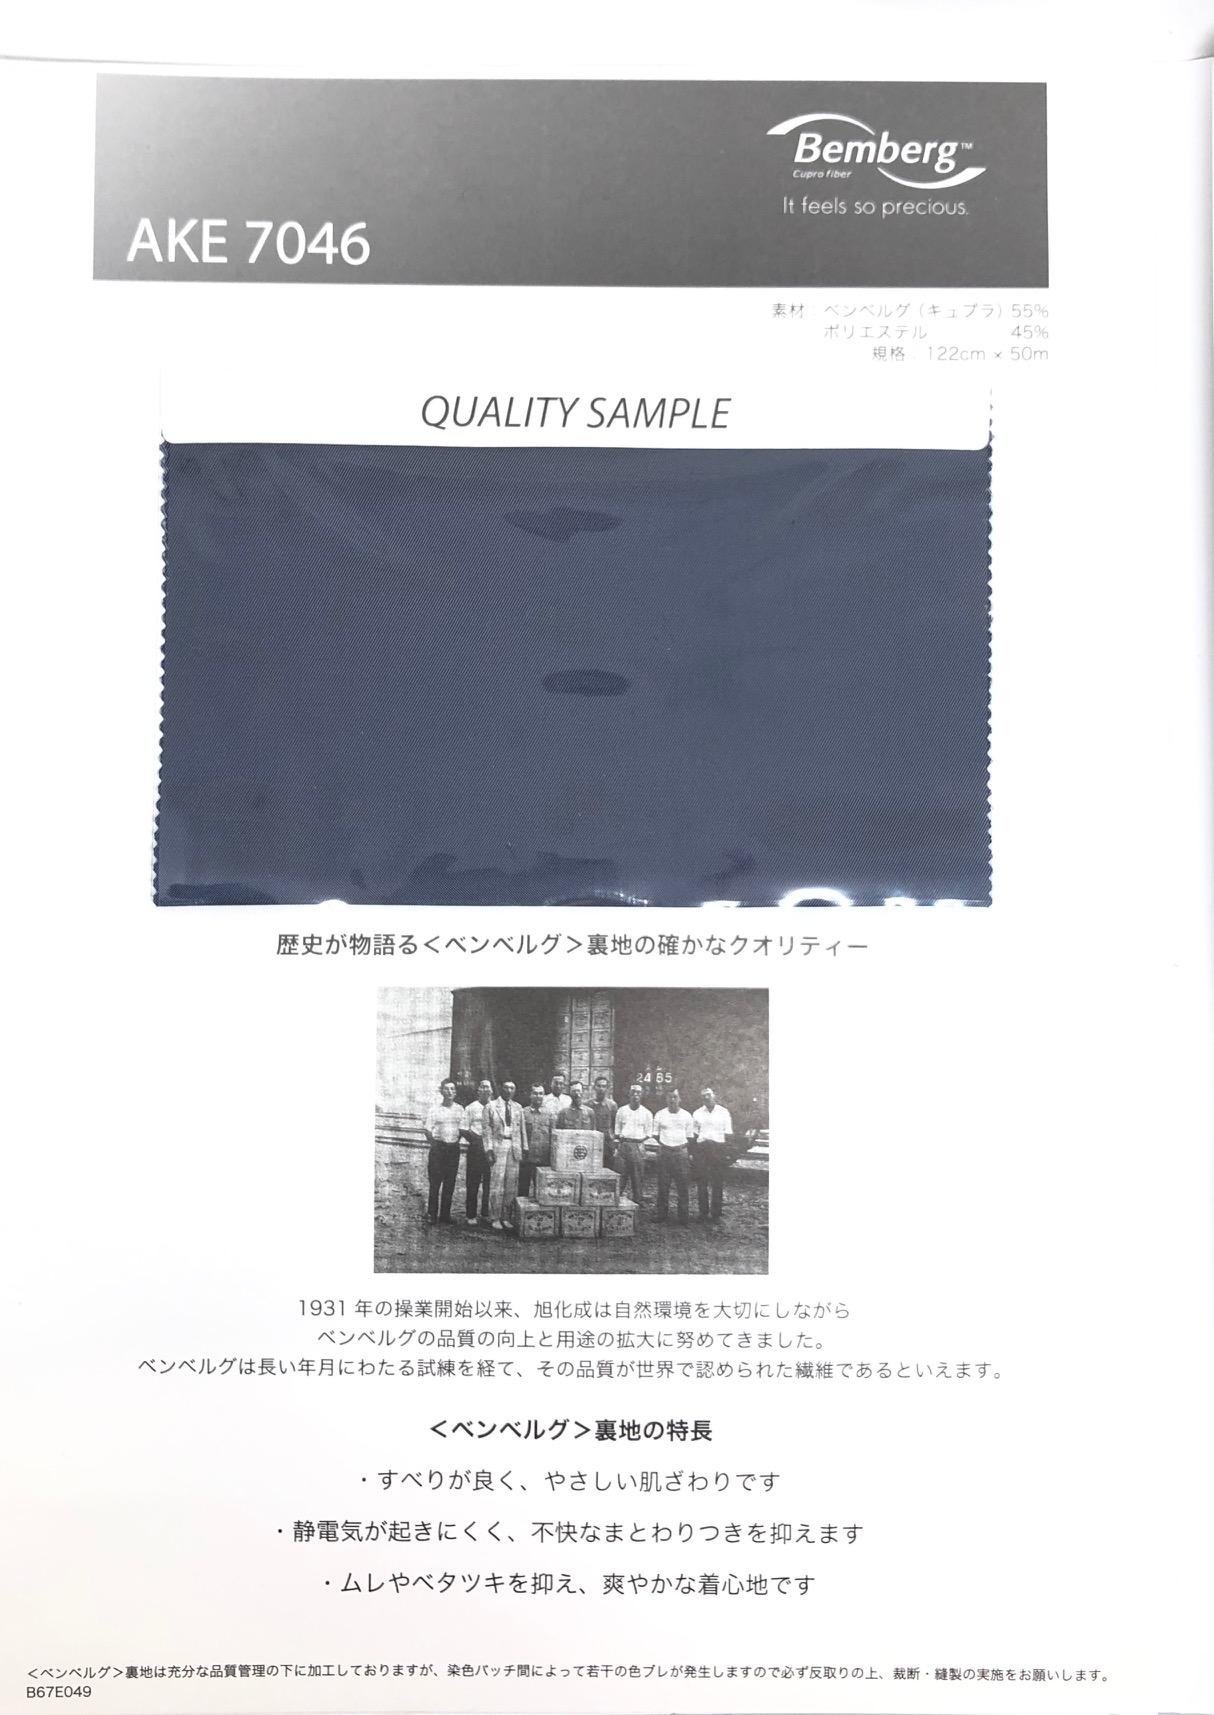 AKE7046 ベンベルグポリエステル交織メンズ用裏地 オークラ商事 - ApparelX アパレル資材卸通販